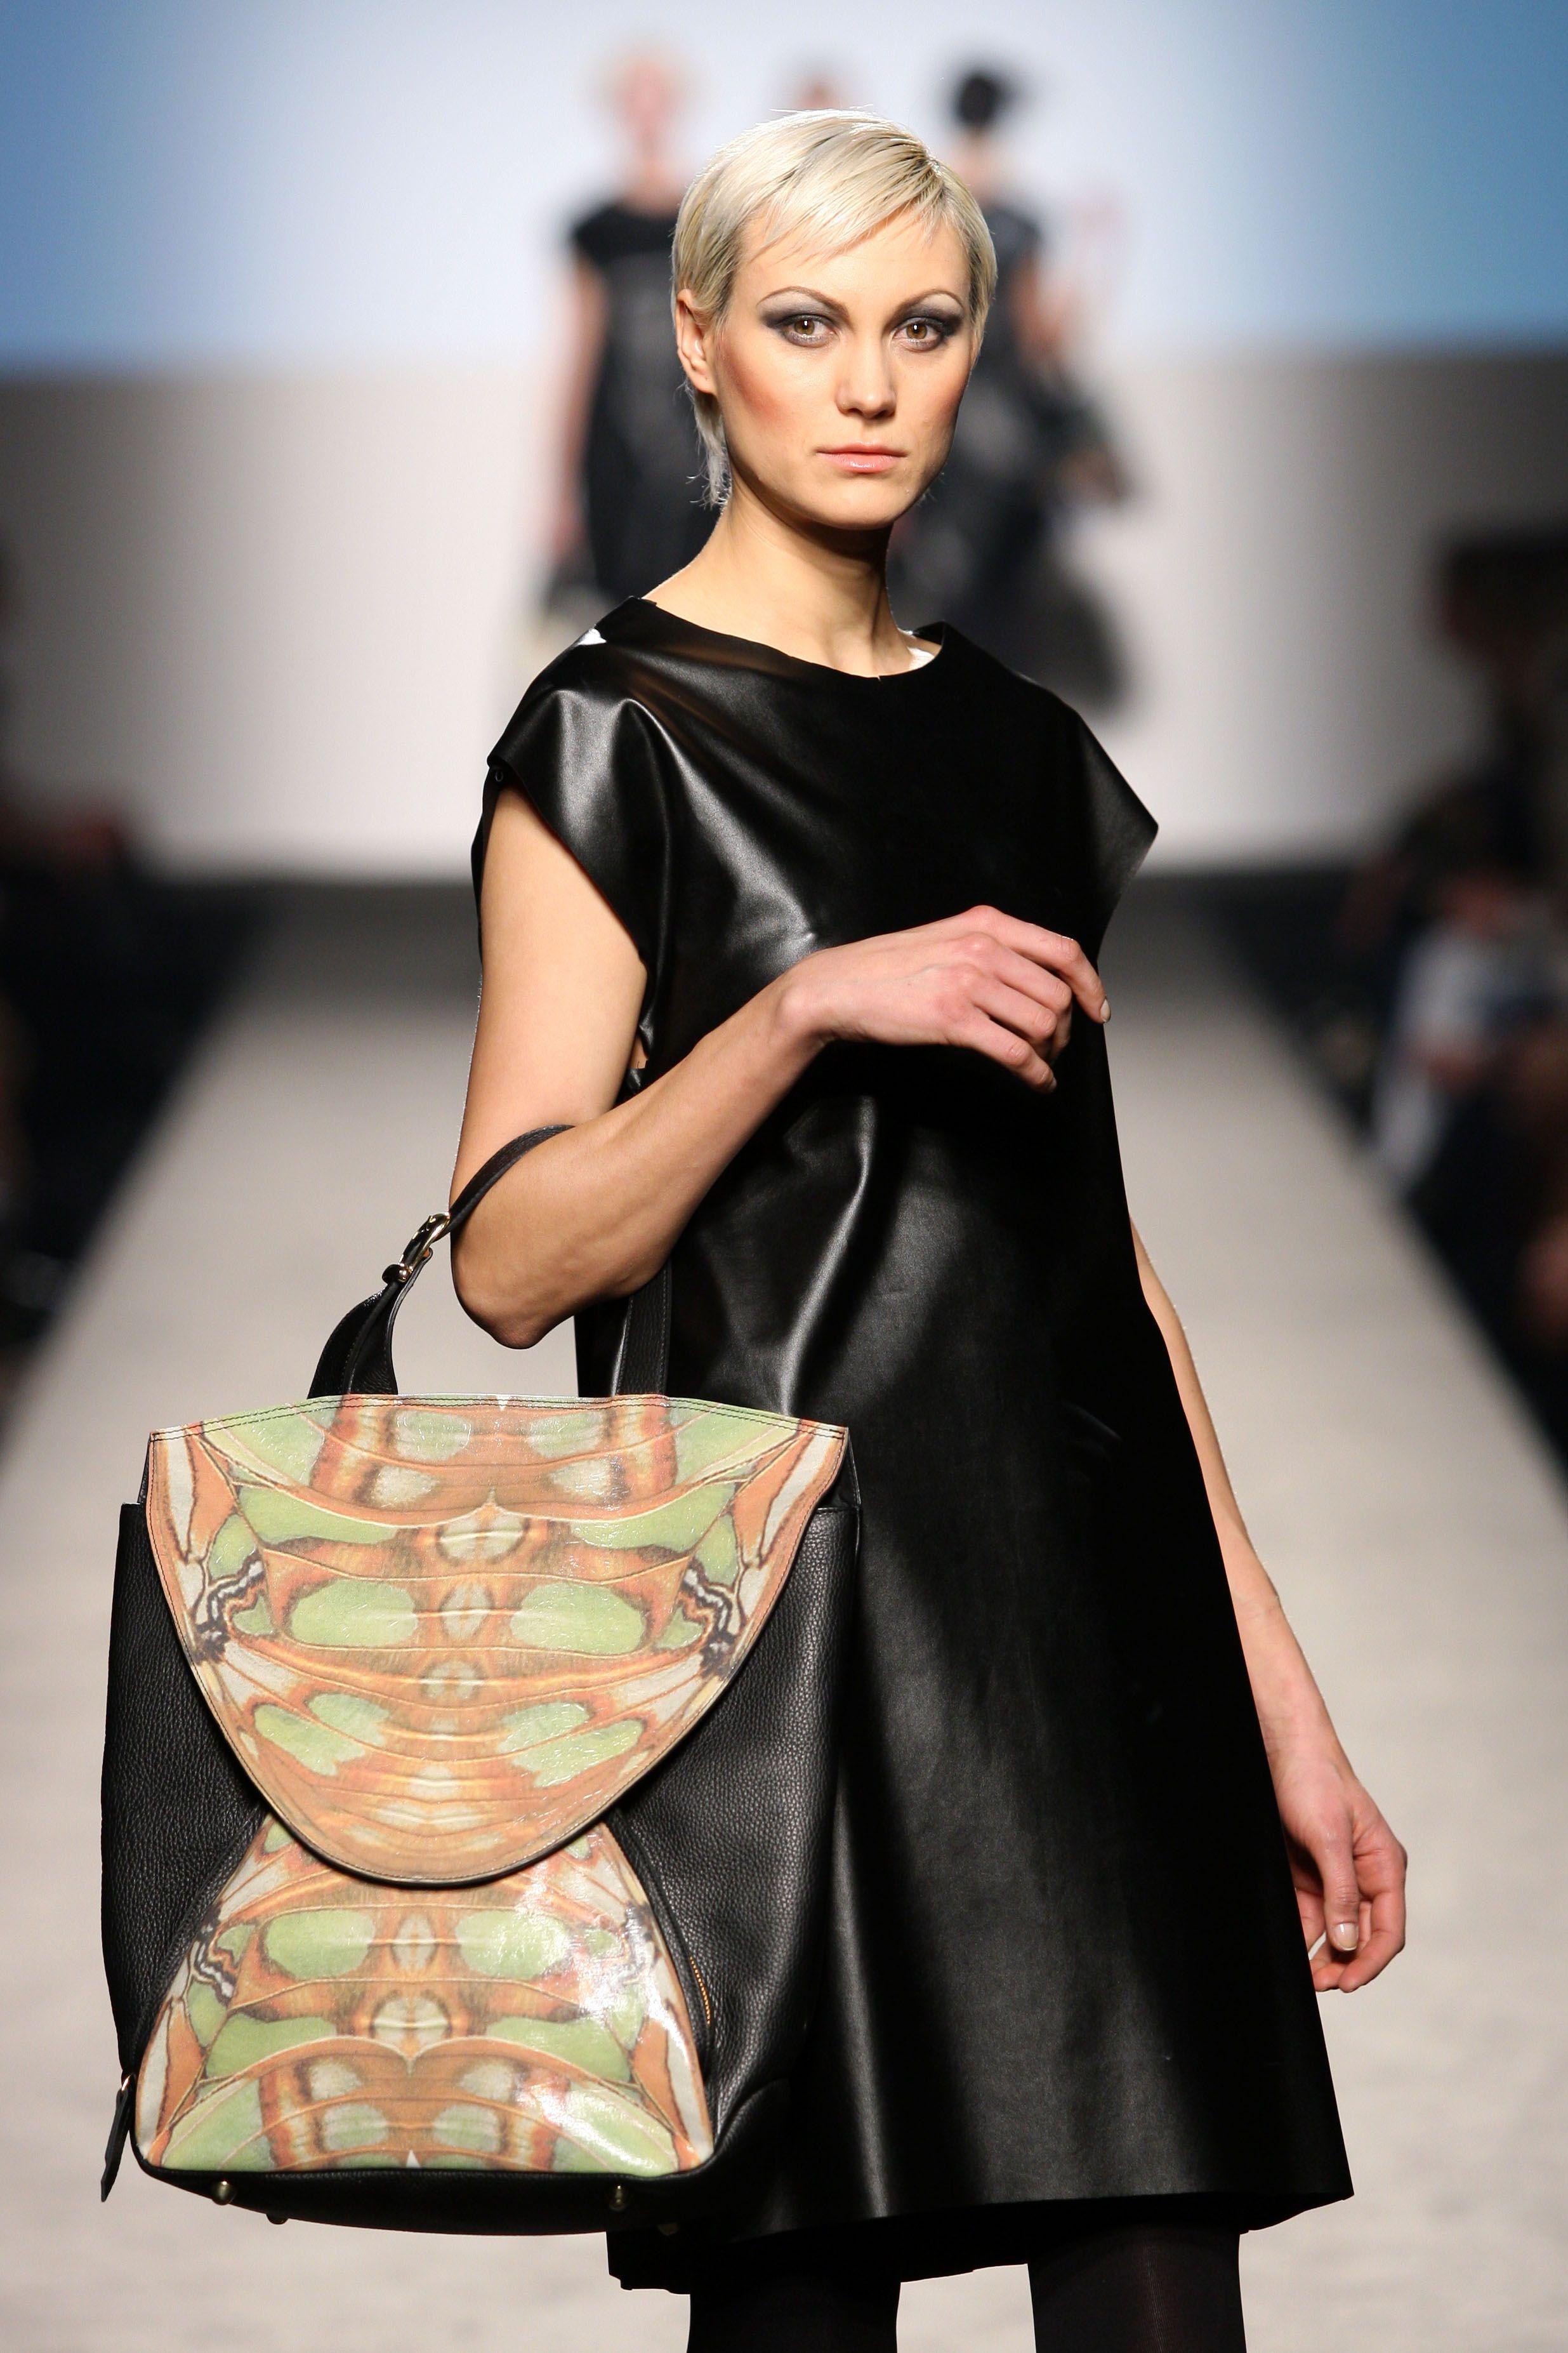 Micromood outfit created by beatrice serlupi crescenzi fashion